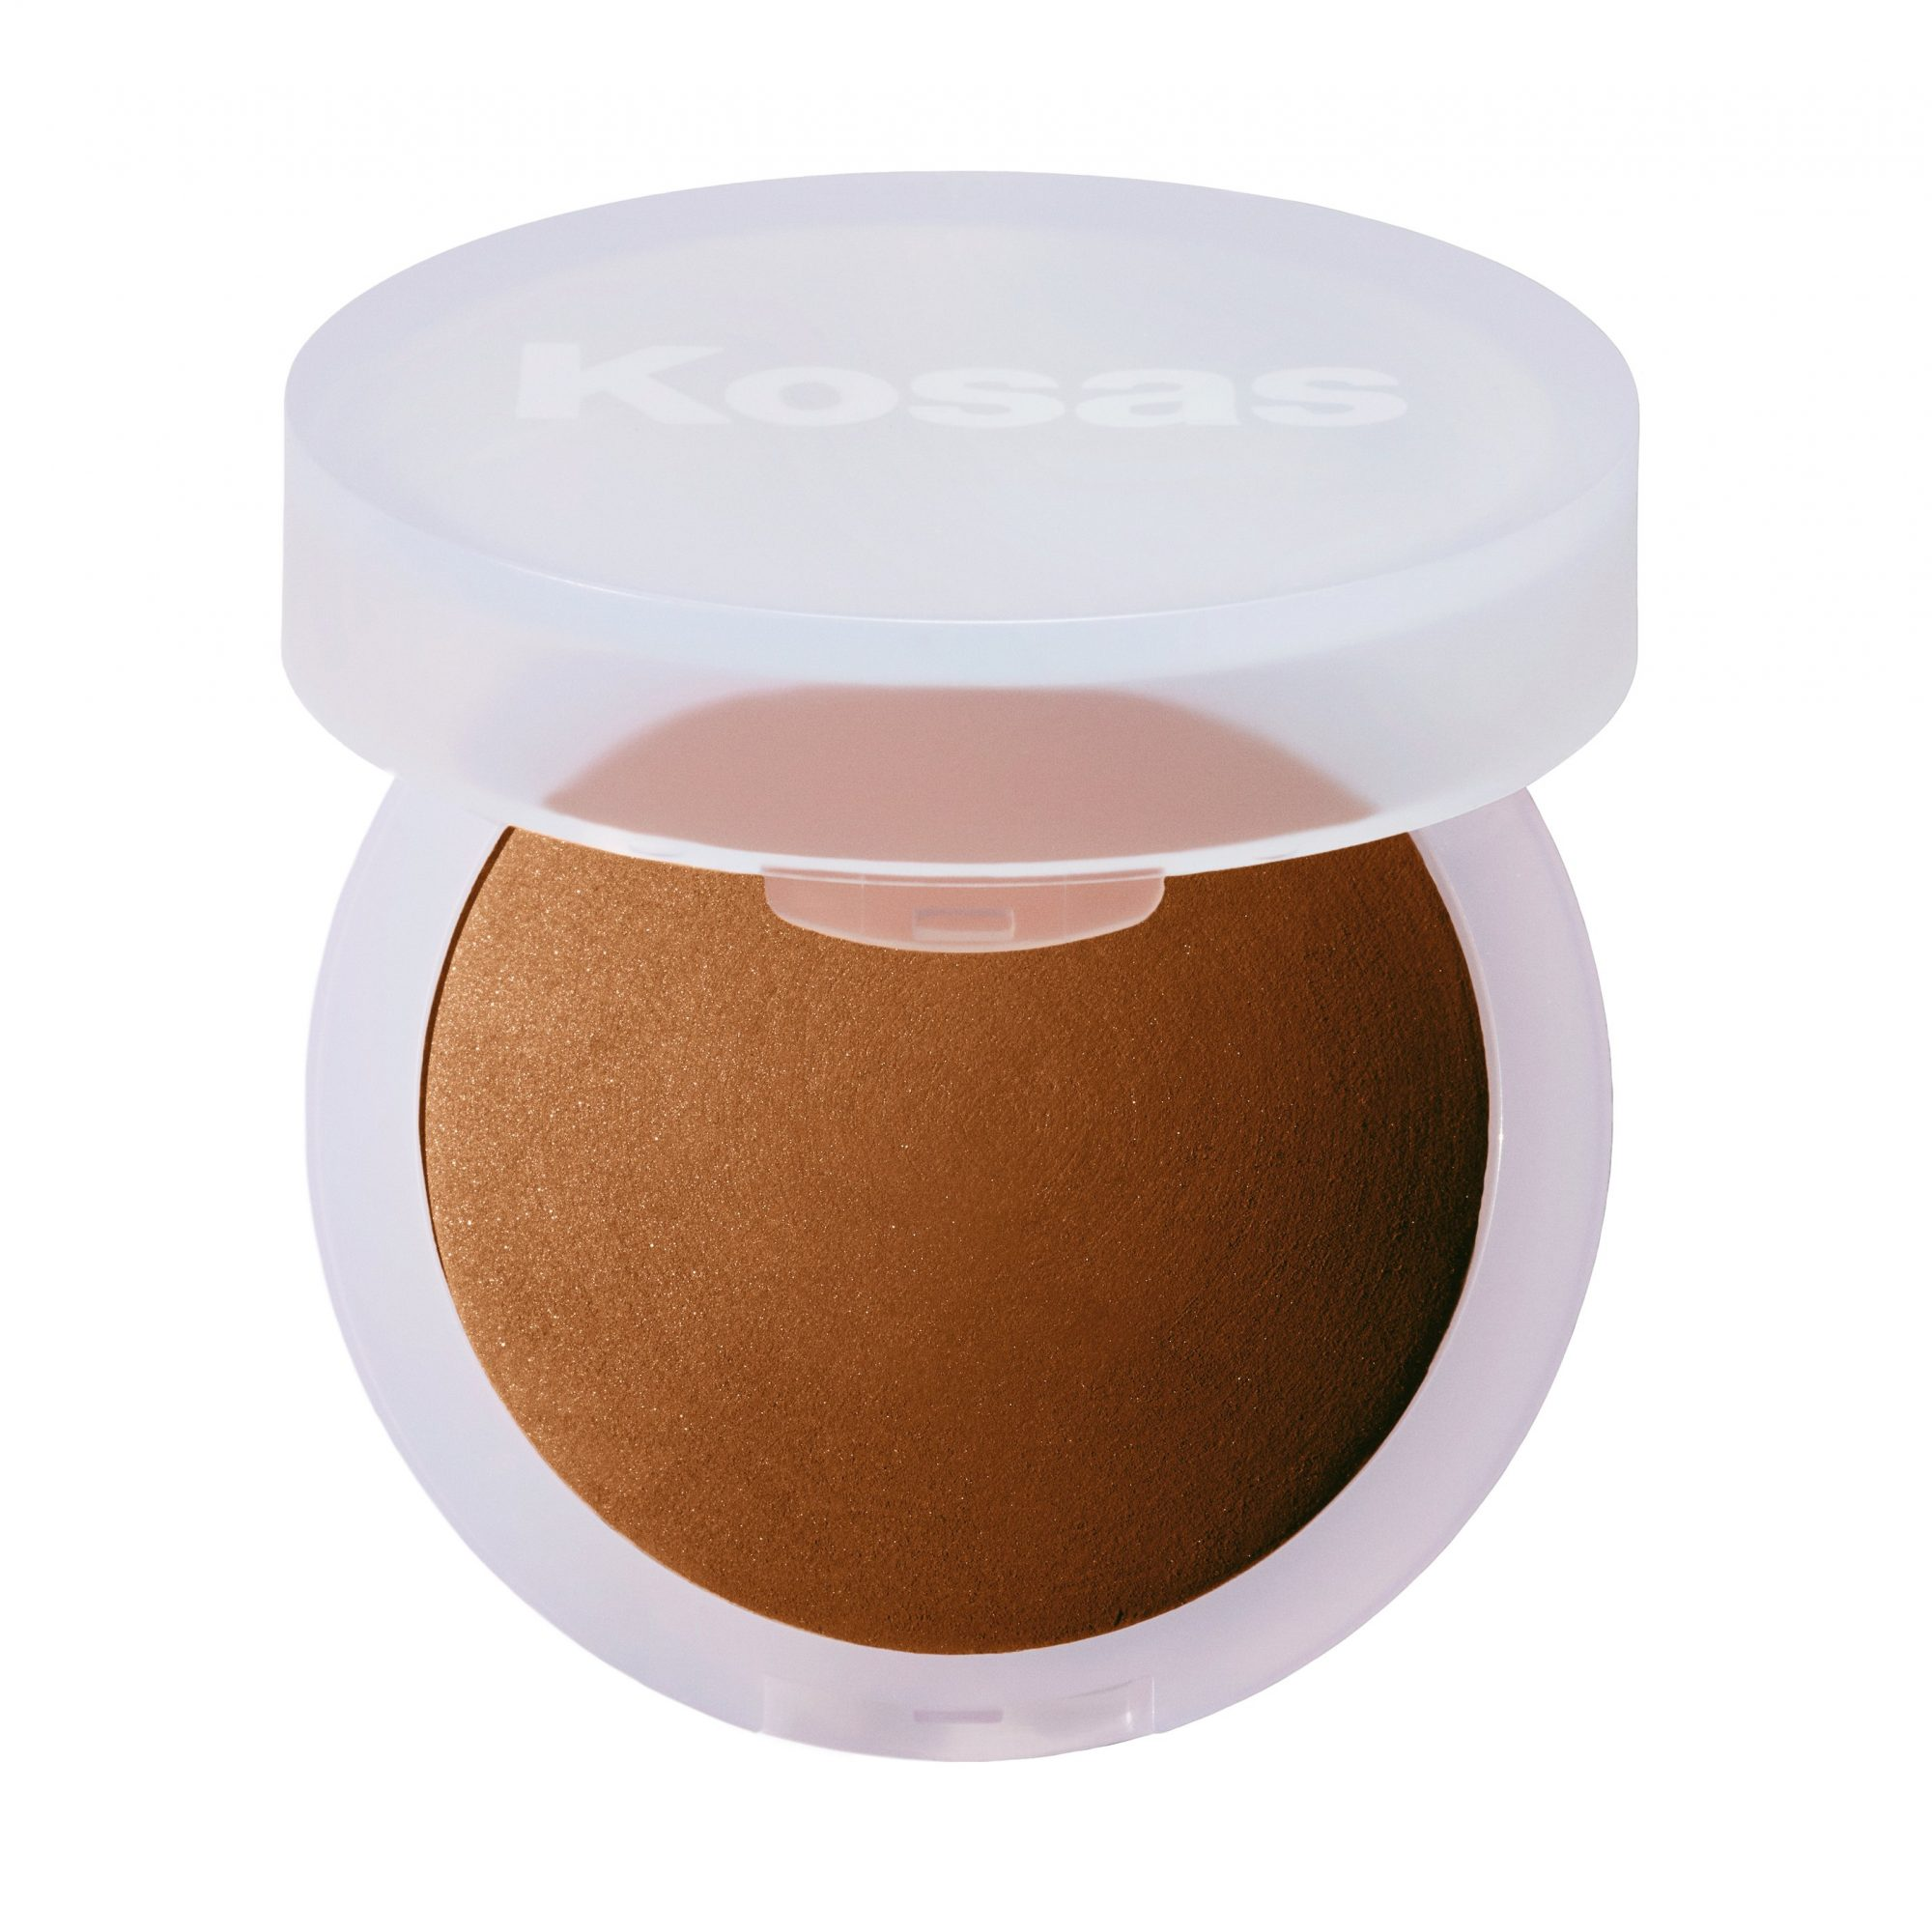 kosas pressed powder